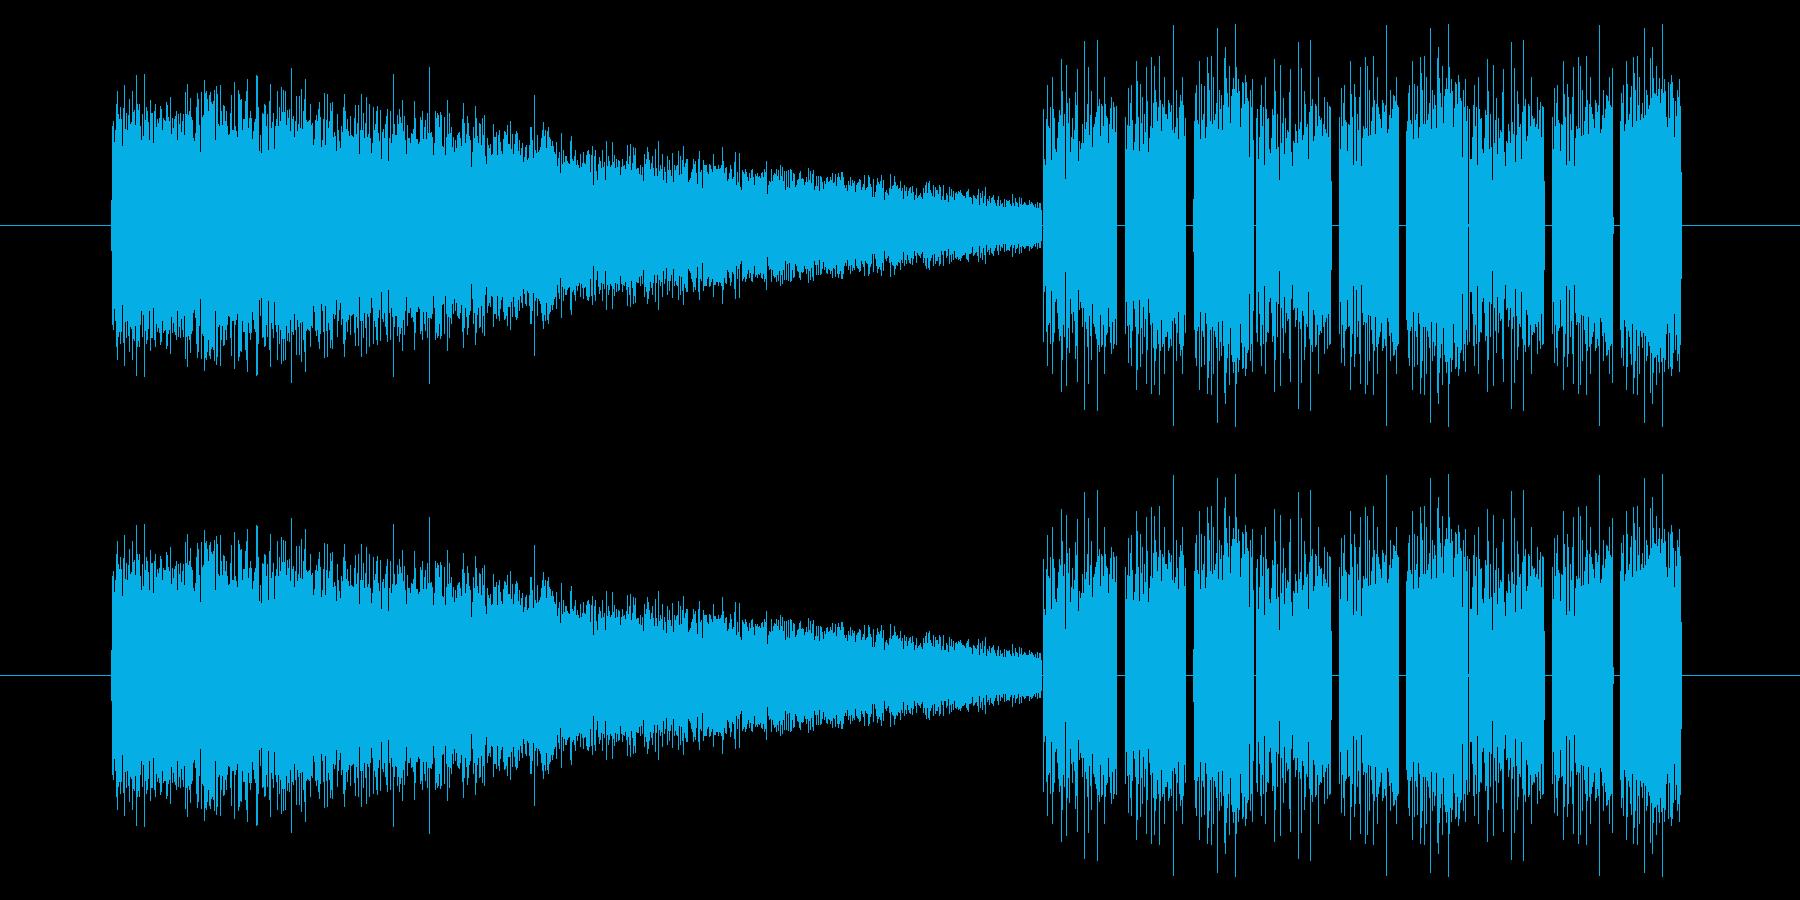 SNES-RPG04-10(魔法 氷3)の再生済みの波形